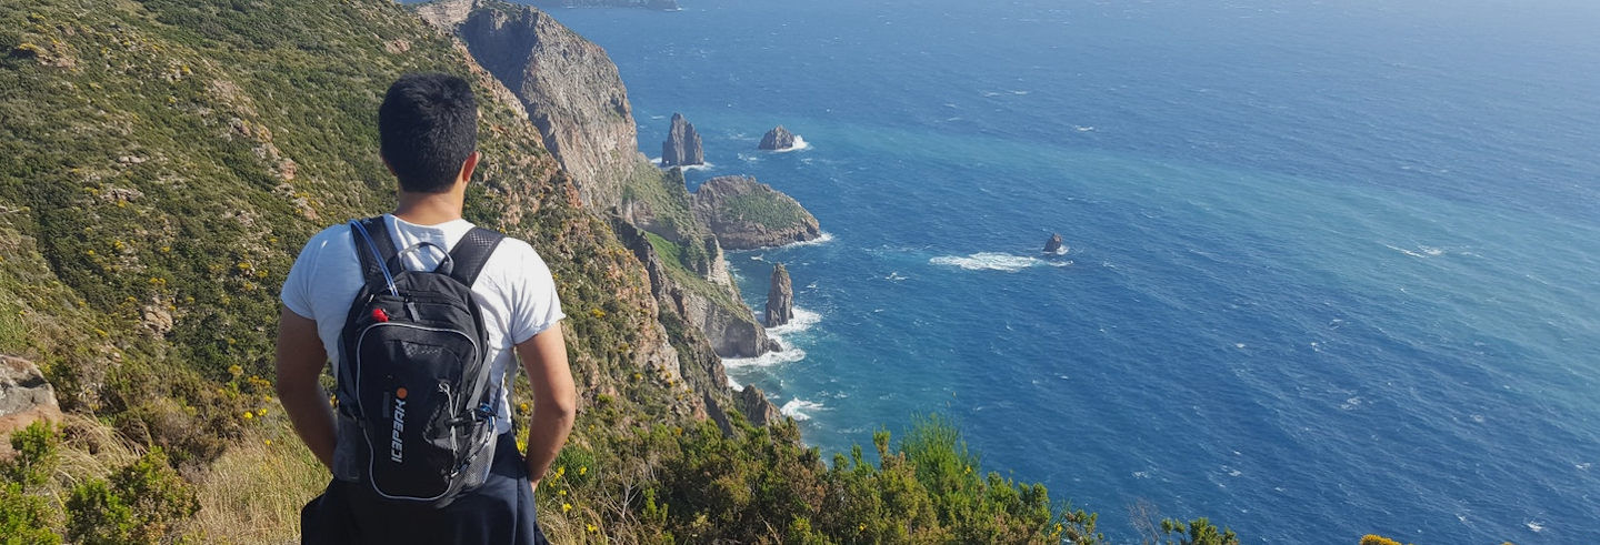 Randonnée à Lipari